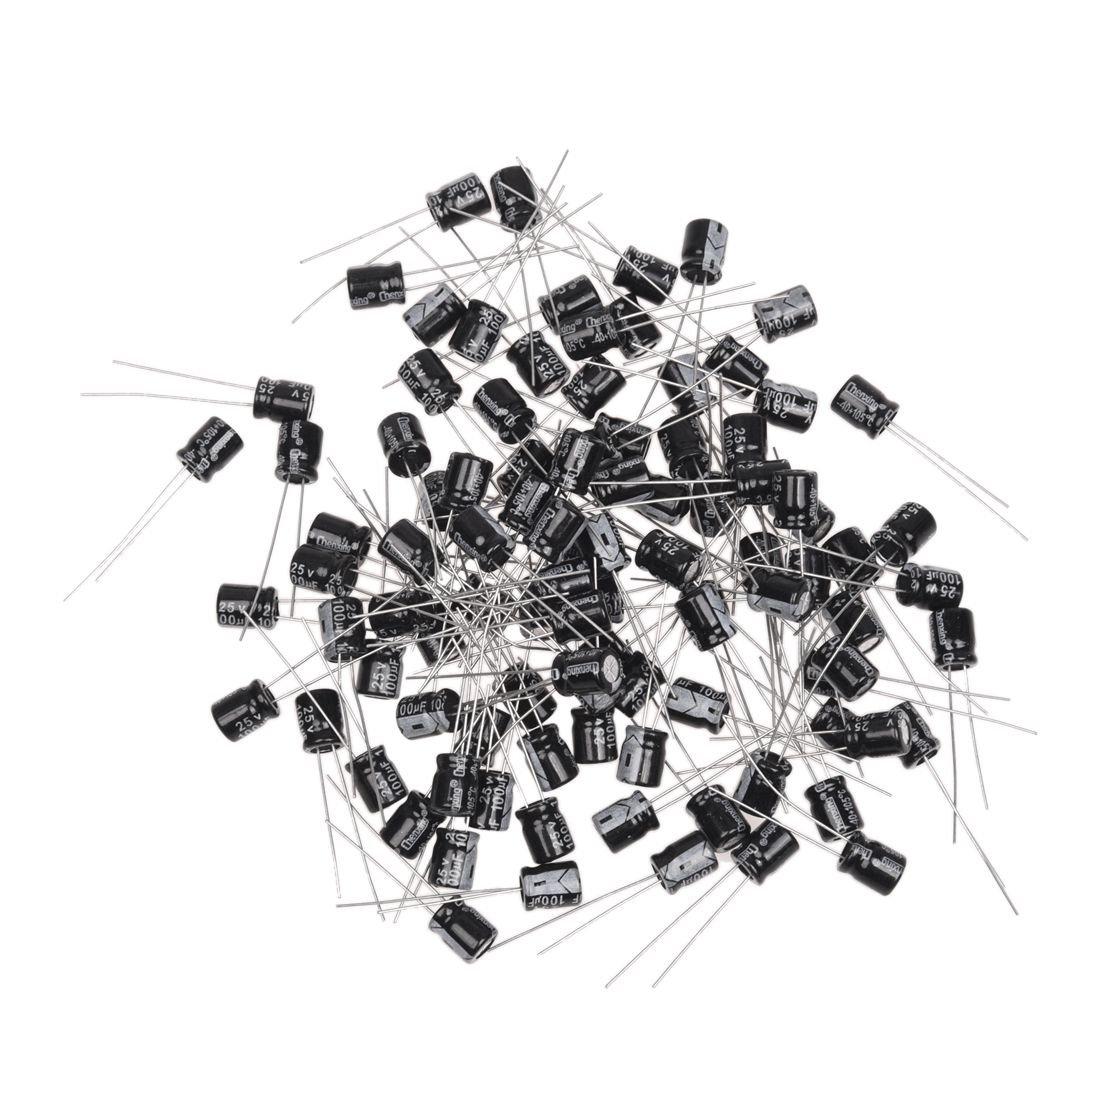 REFURBISHHOUSE 100 Stueck 25V 100uF 105C Radial Leitungsdraht Elektrolytkondensatoren